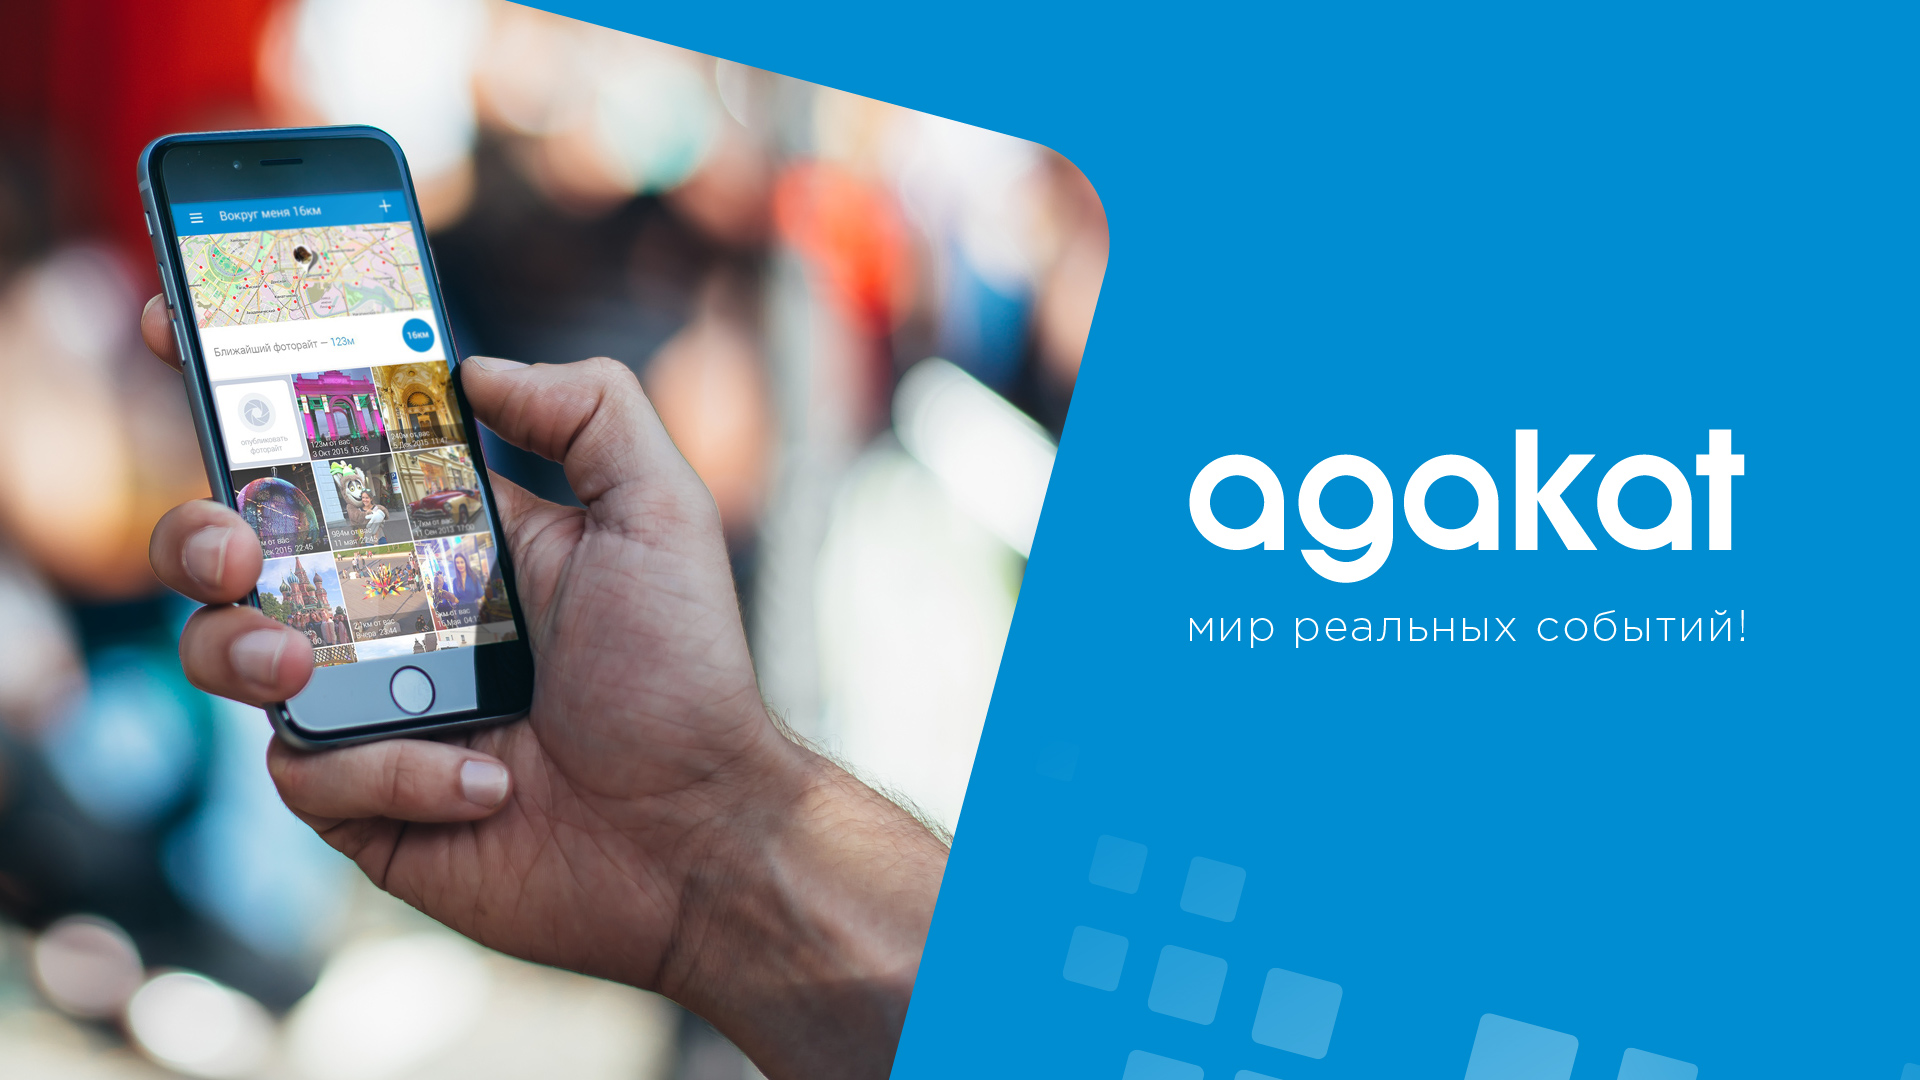 Agakat — самая честная социальная сеть